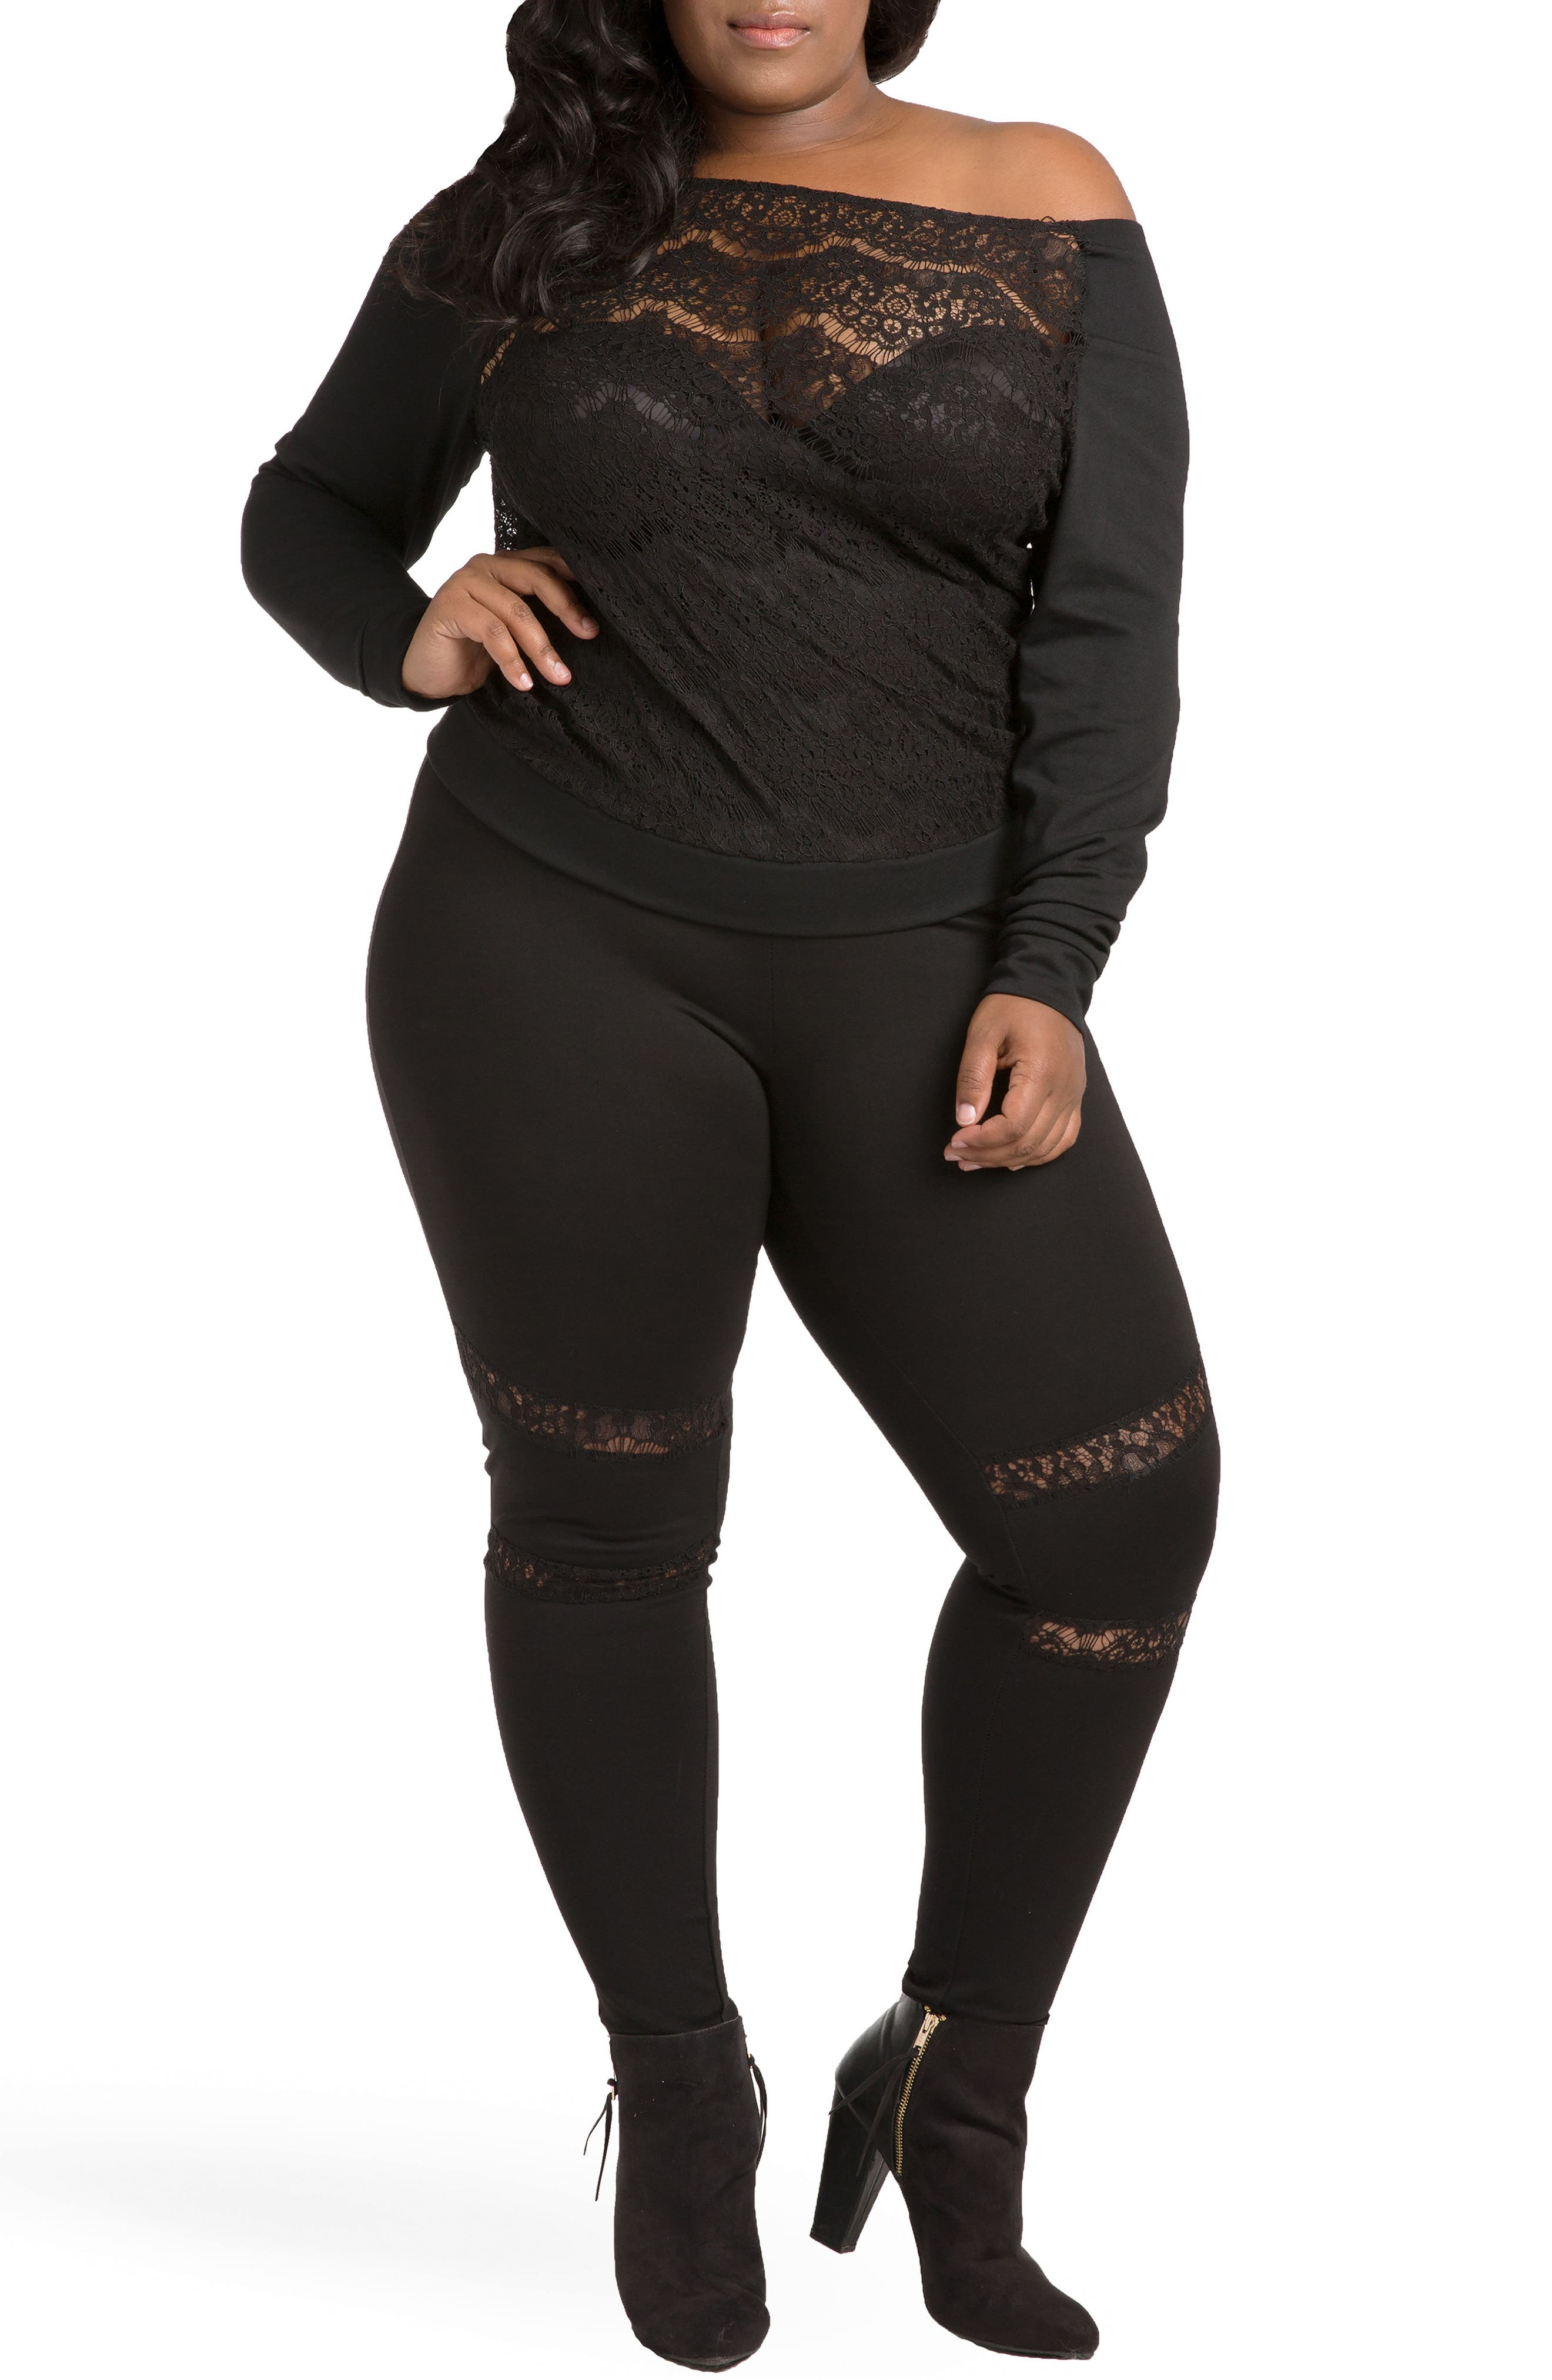 Janet Curvy Fit Leggings,                             Alternate thumbnail 2, color,                             Black